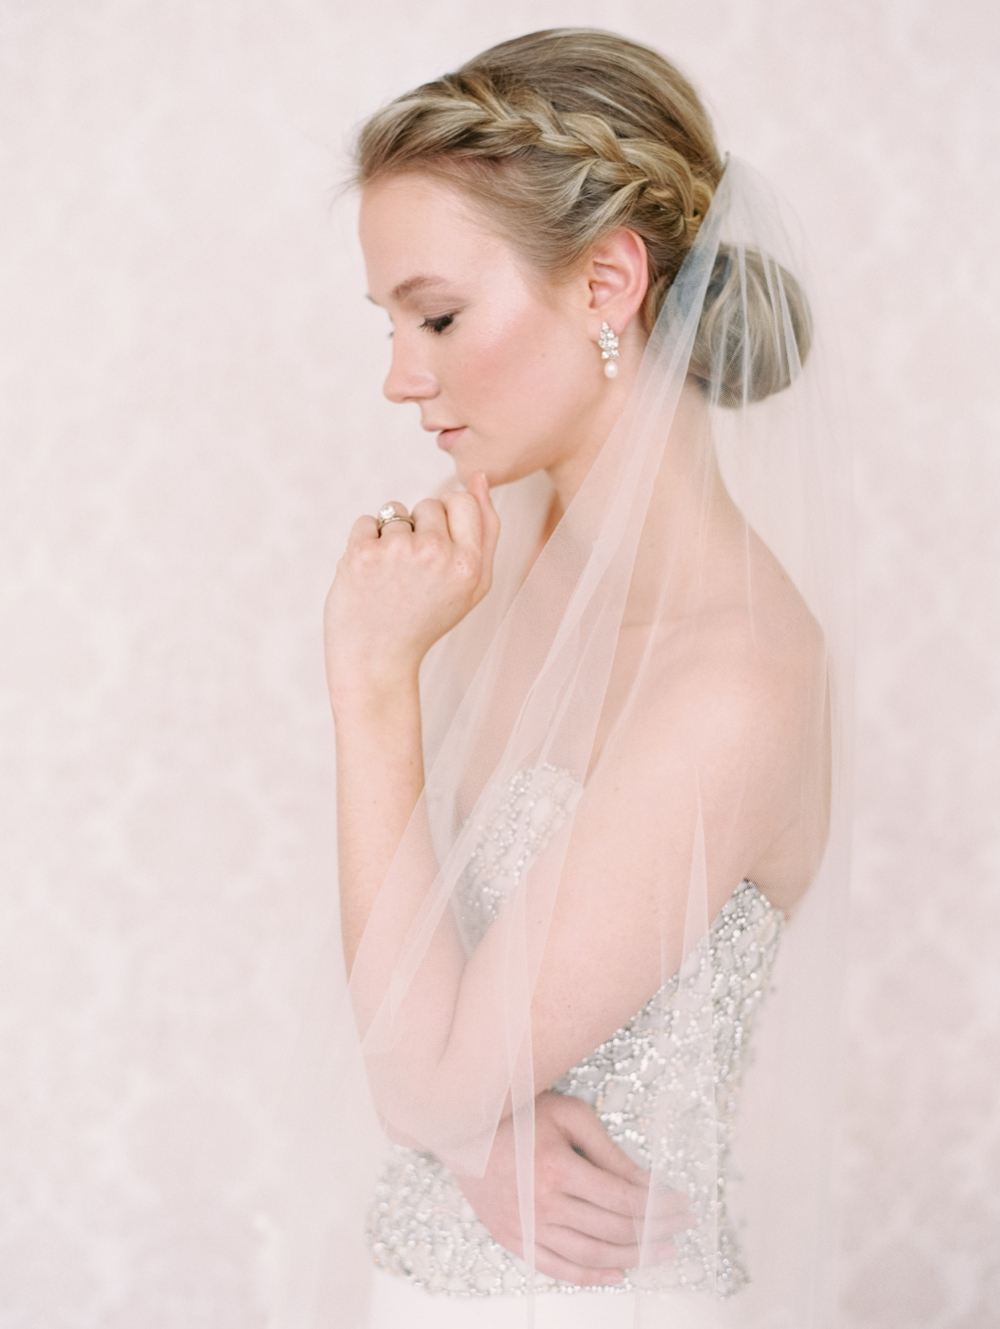 Calgary wedding photographers | bridal look book 2016 | Bridal boutique yyc | editorial photography